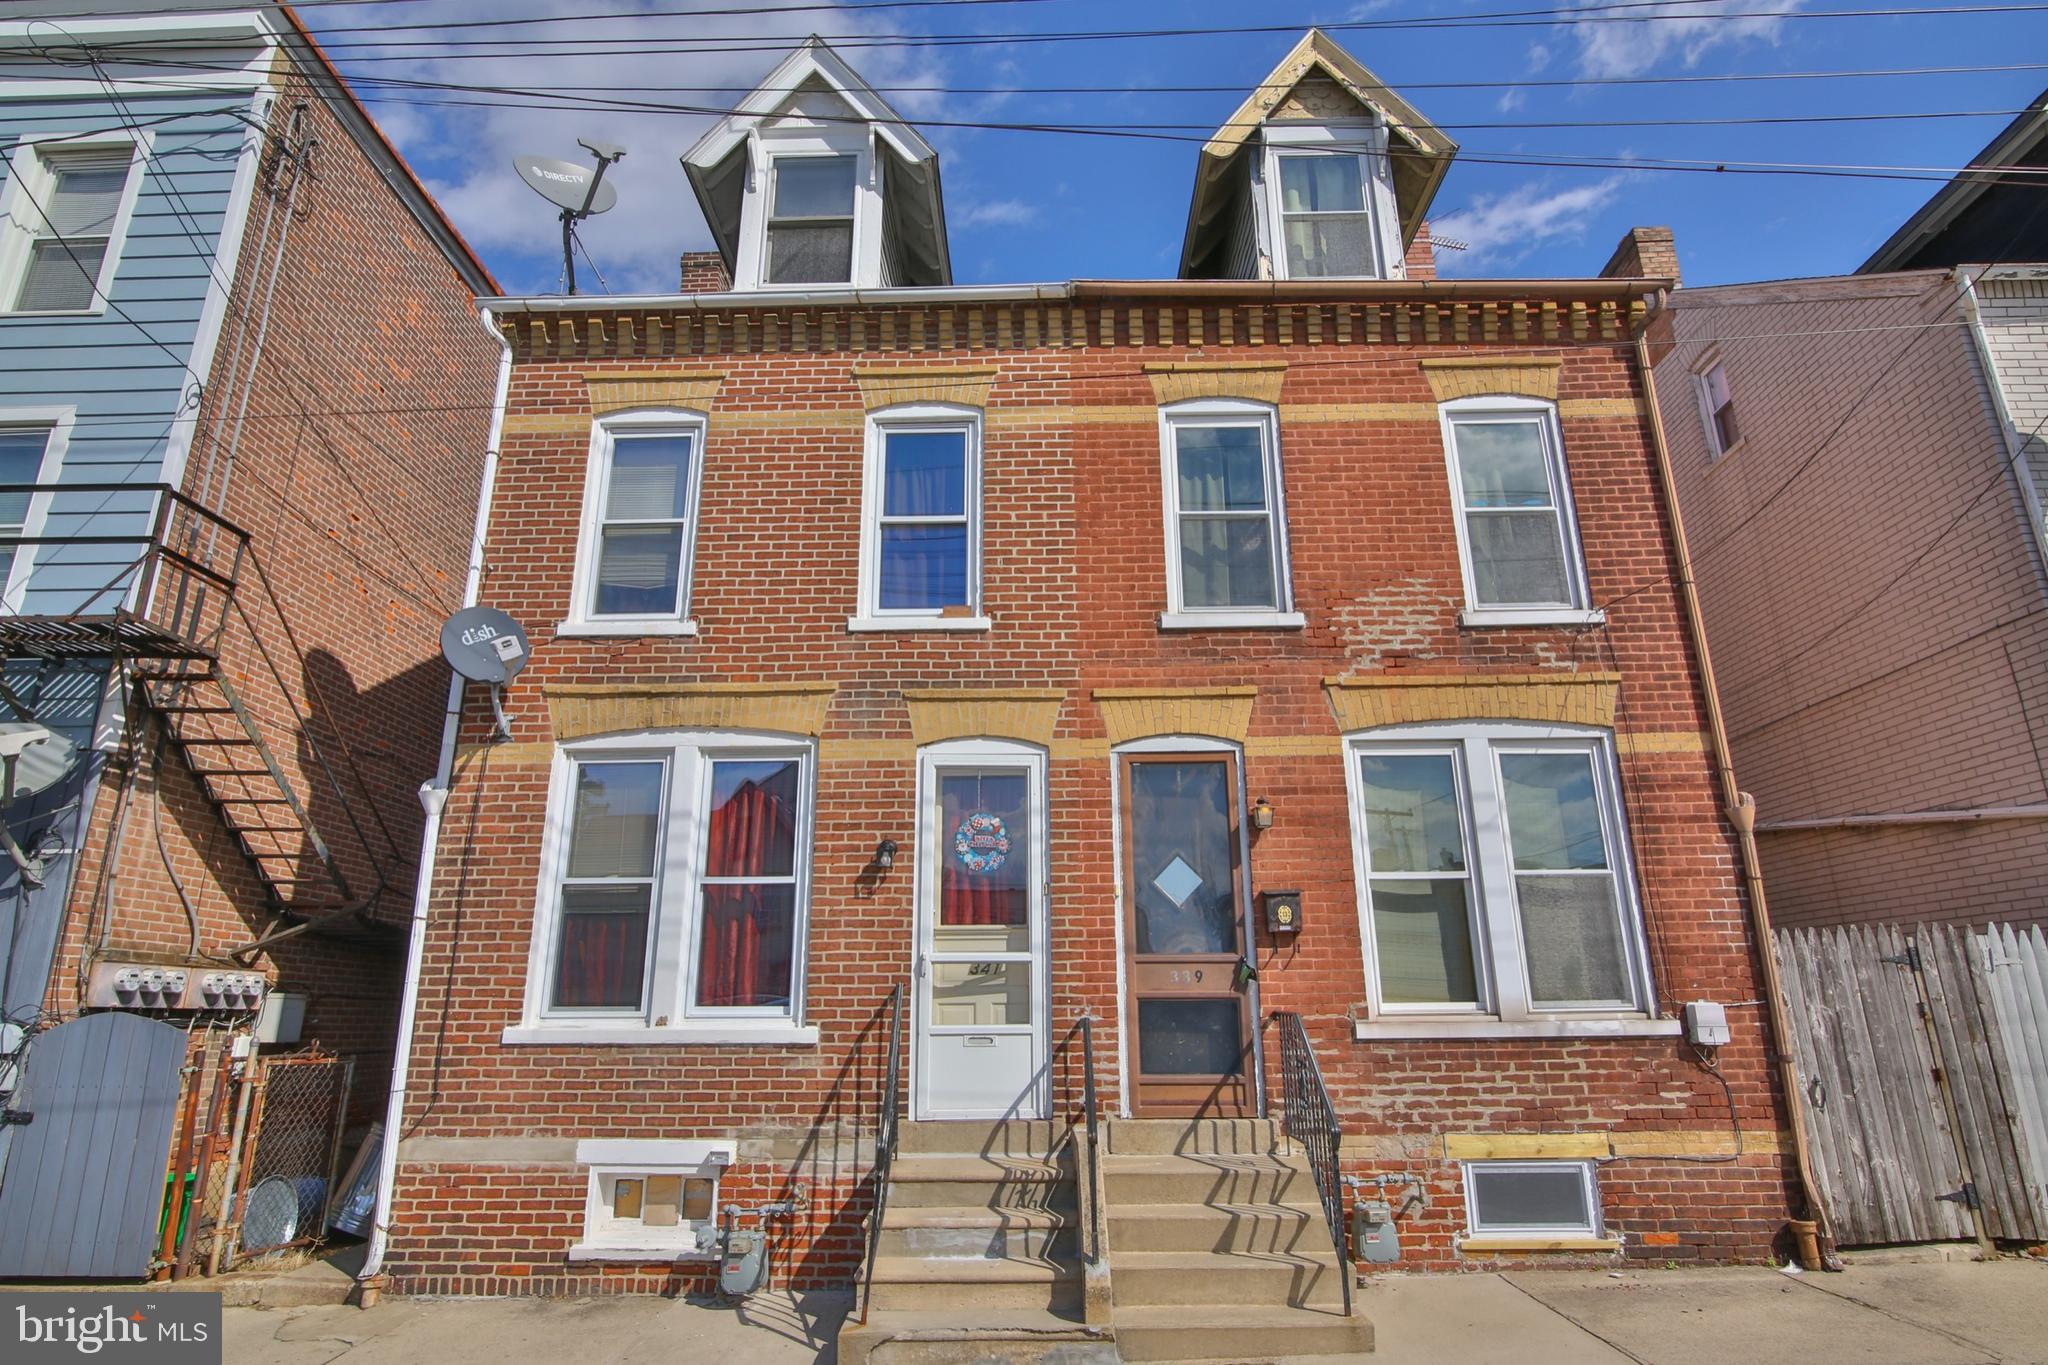 341 N 14TH STREET, ALLENTOWN, PA 18102